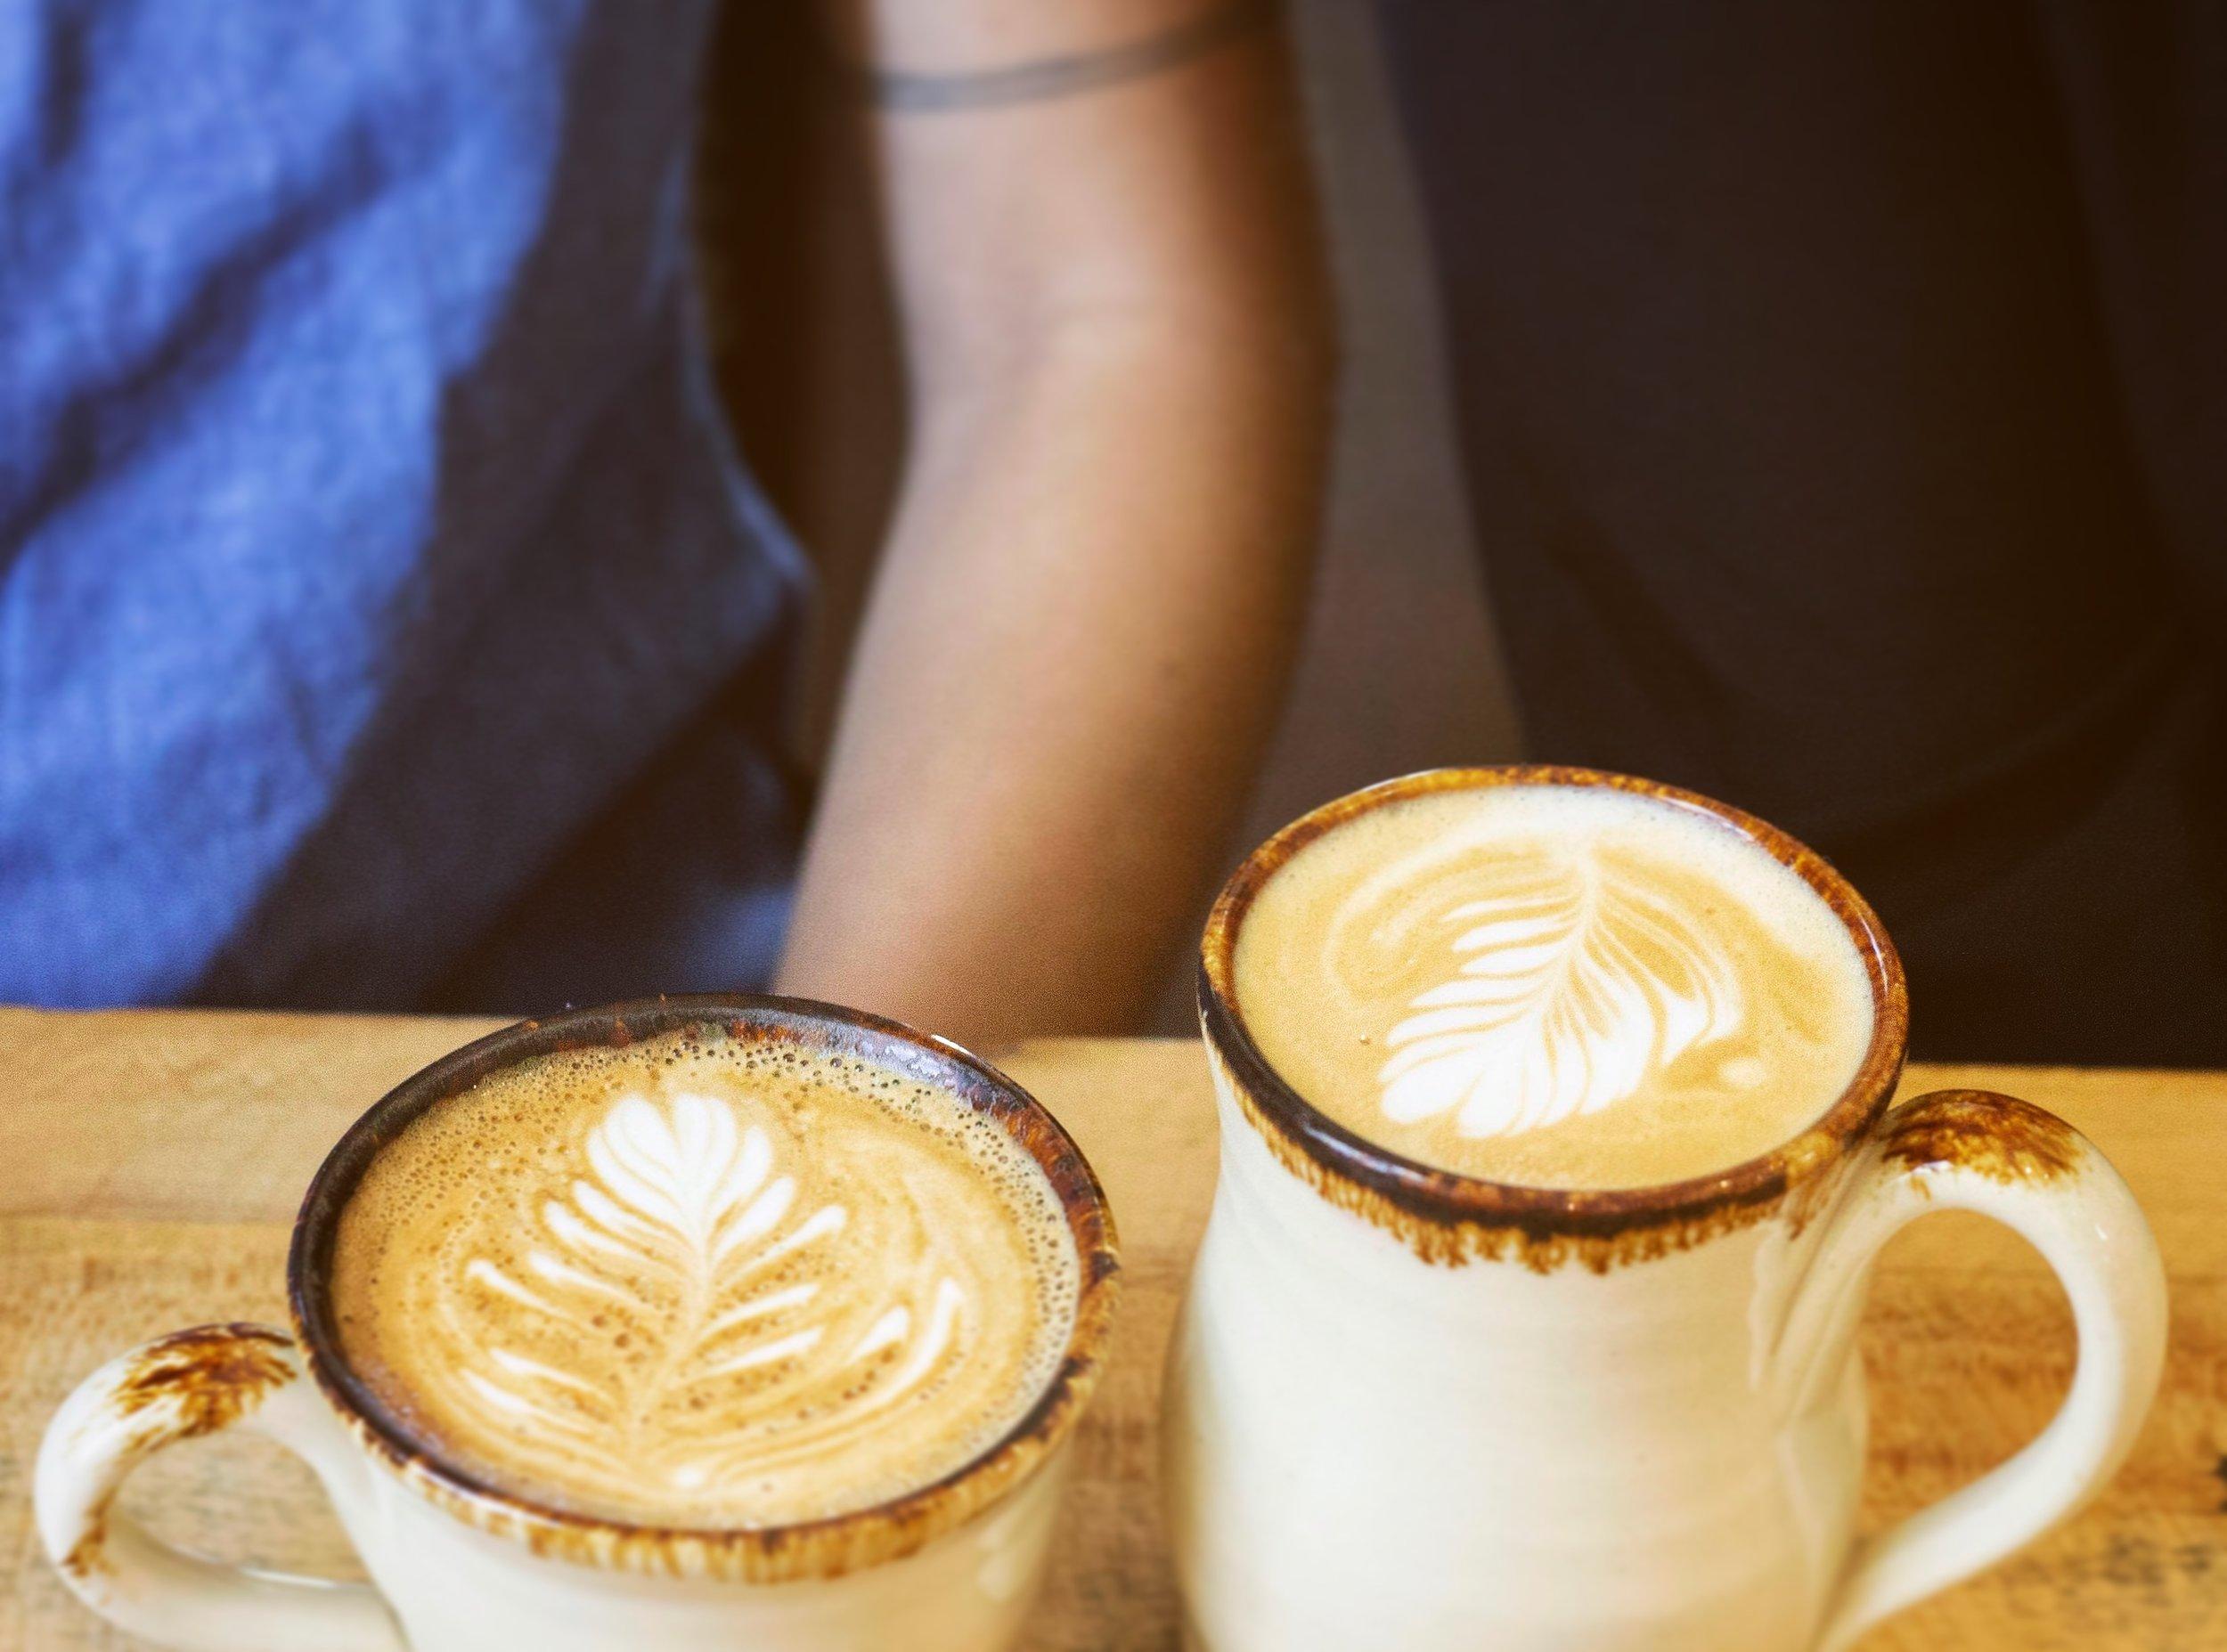 Handmade Delicious Latte Art and Handmade Mug